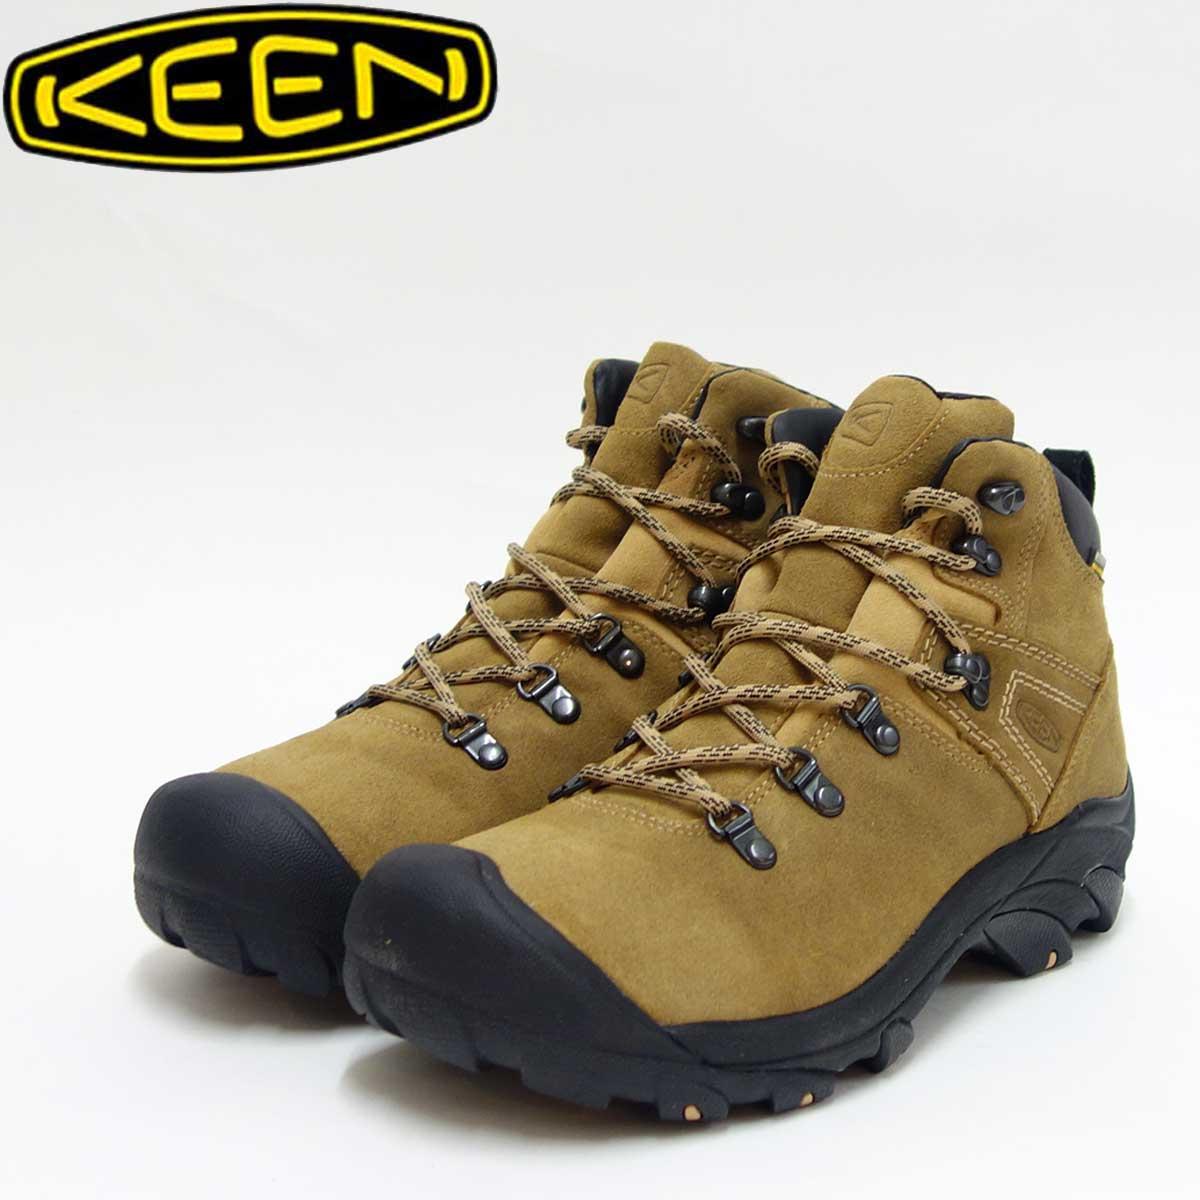 KEEN キーン Pyenees 1017348 ピレニーズ Latte(メンズ)防水仕様、オールレザーのハイキングシューズ「靴」